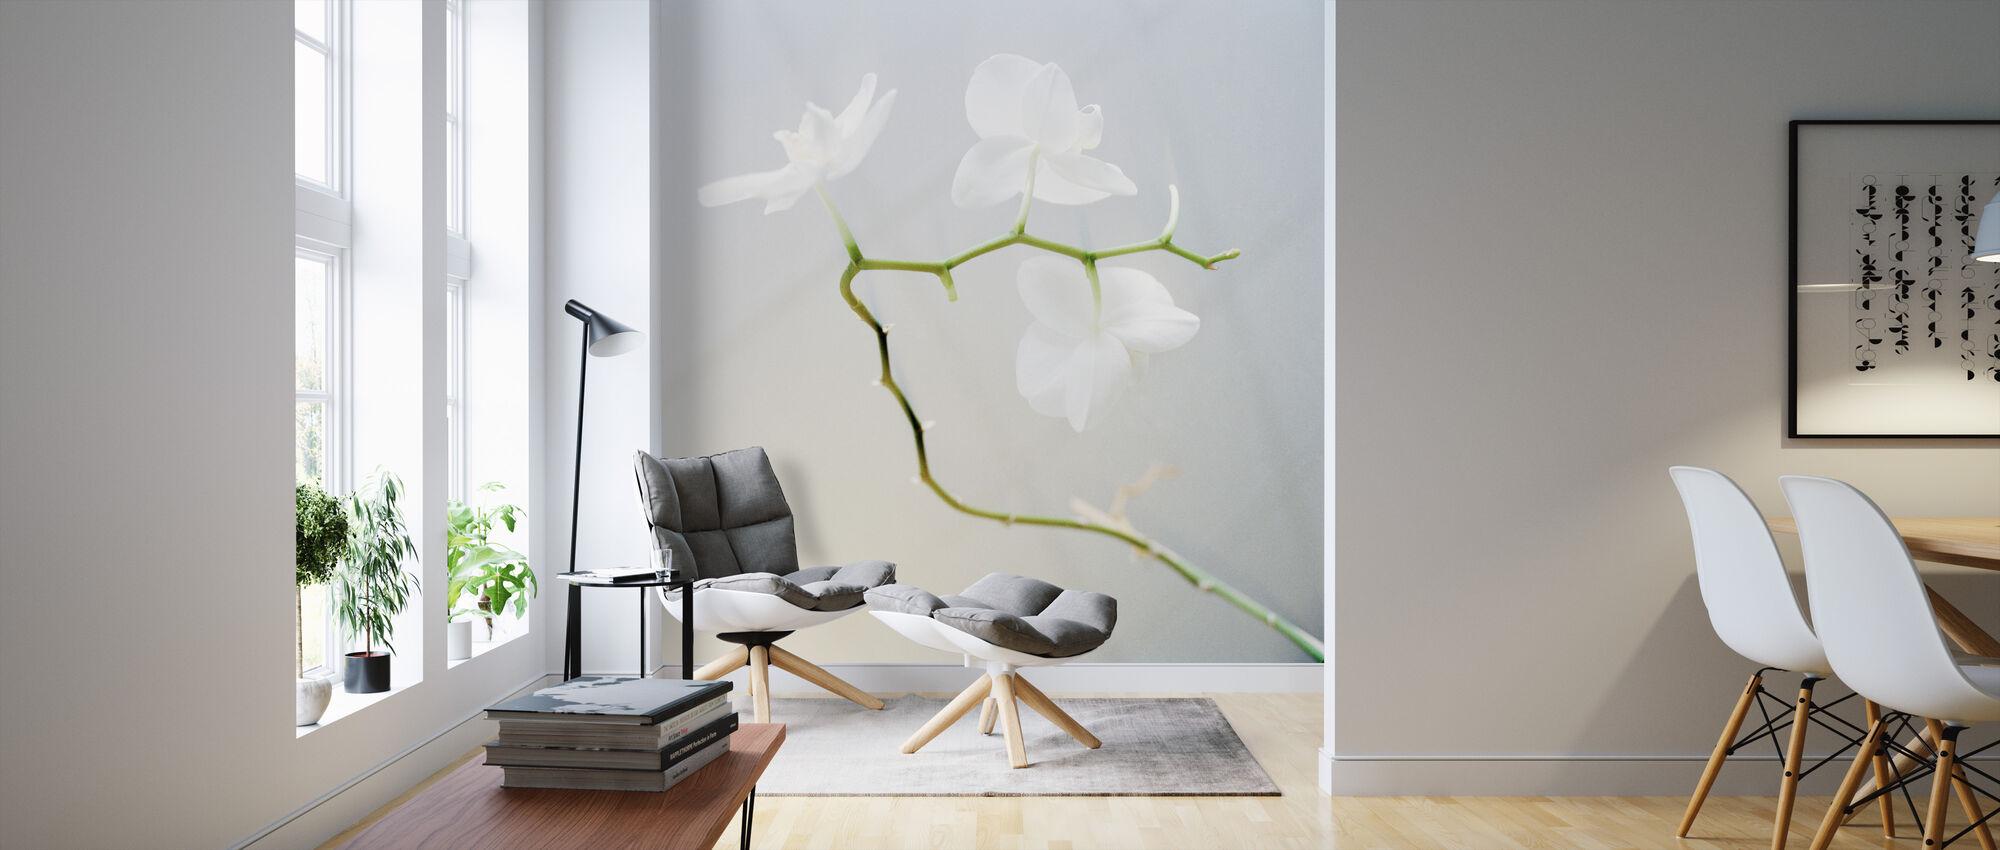 Orchid - Wallpaper - Living Room